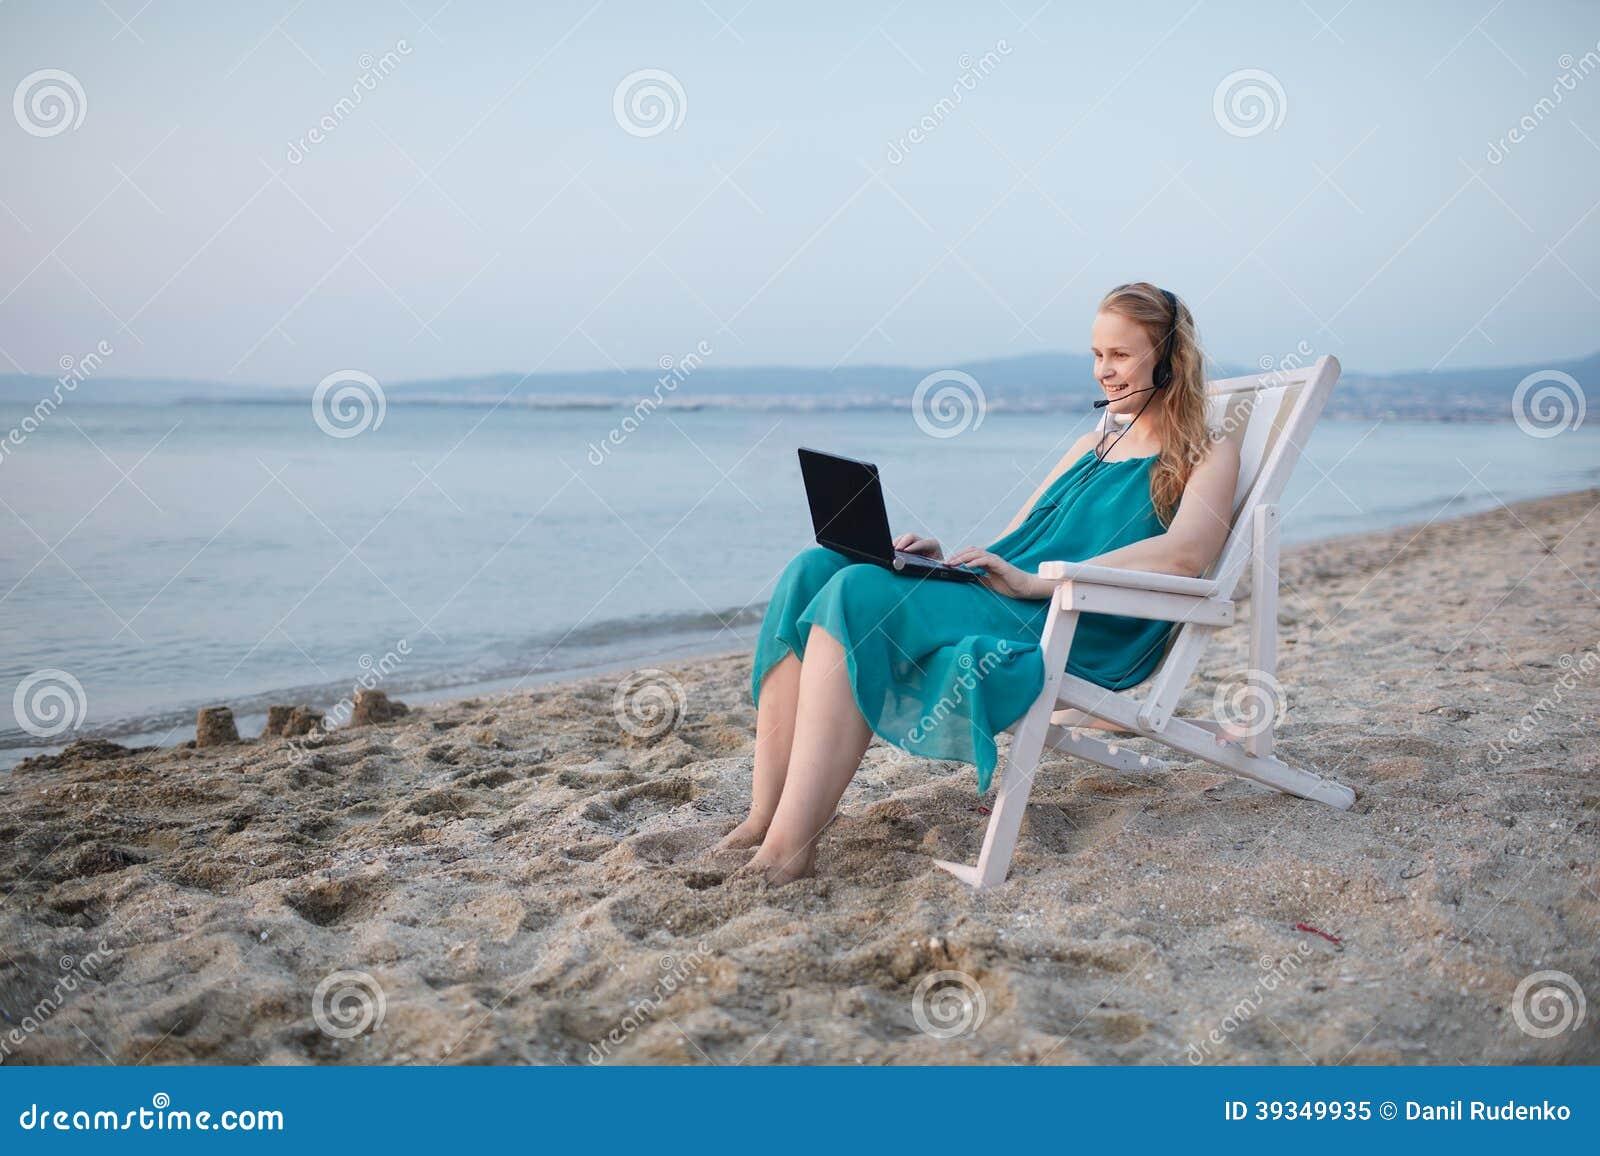 skype womens id